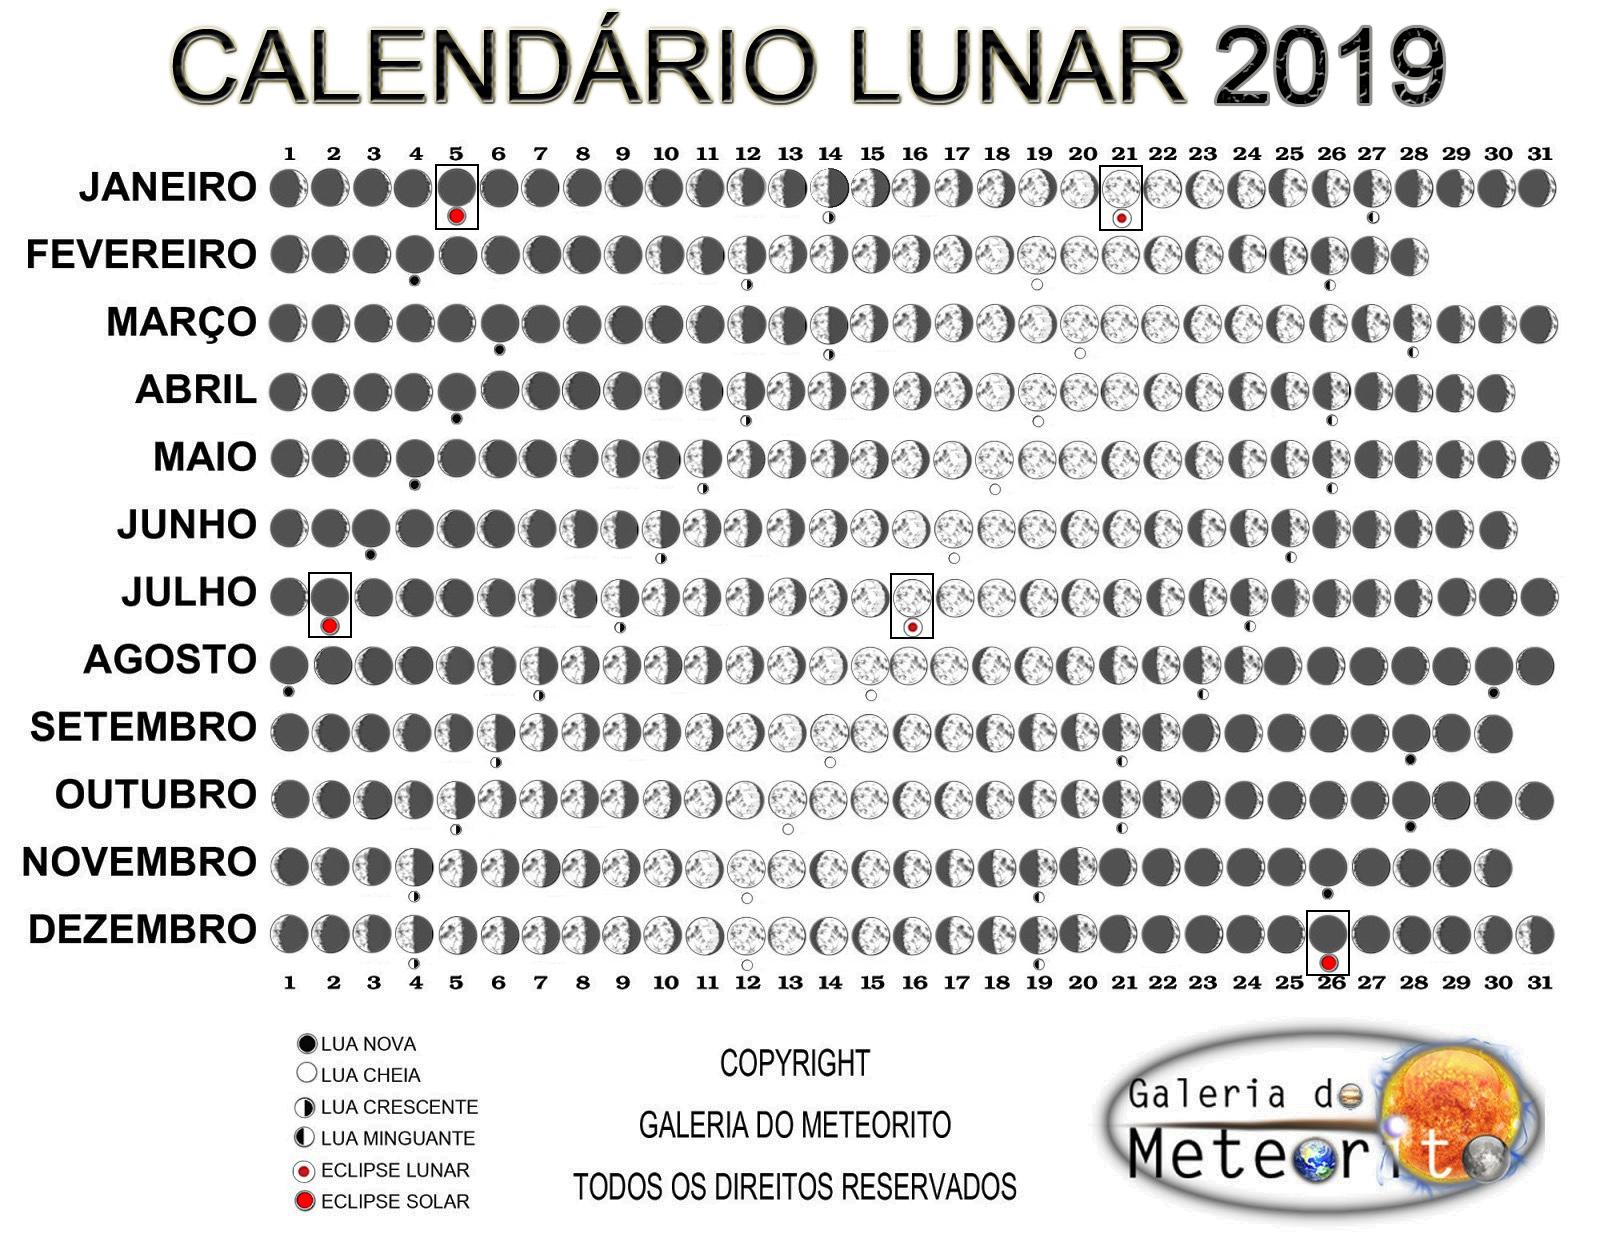 Calendario Lunar Cannabico 2019 Espana.Top 10 Punto Medio Noticias Calendario Lunar 2019 Julio